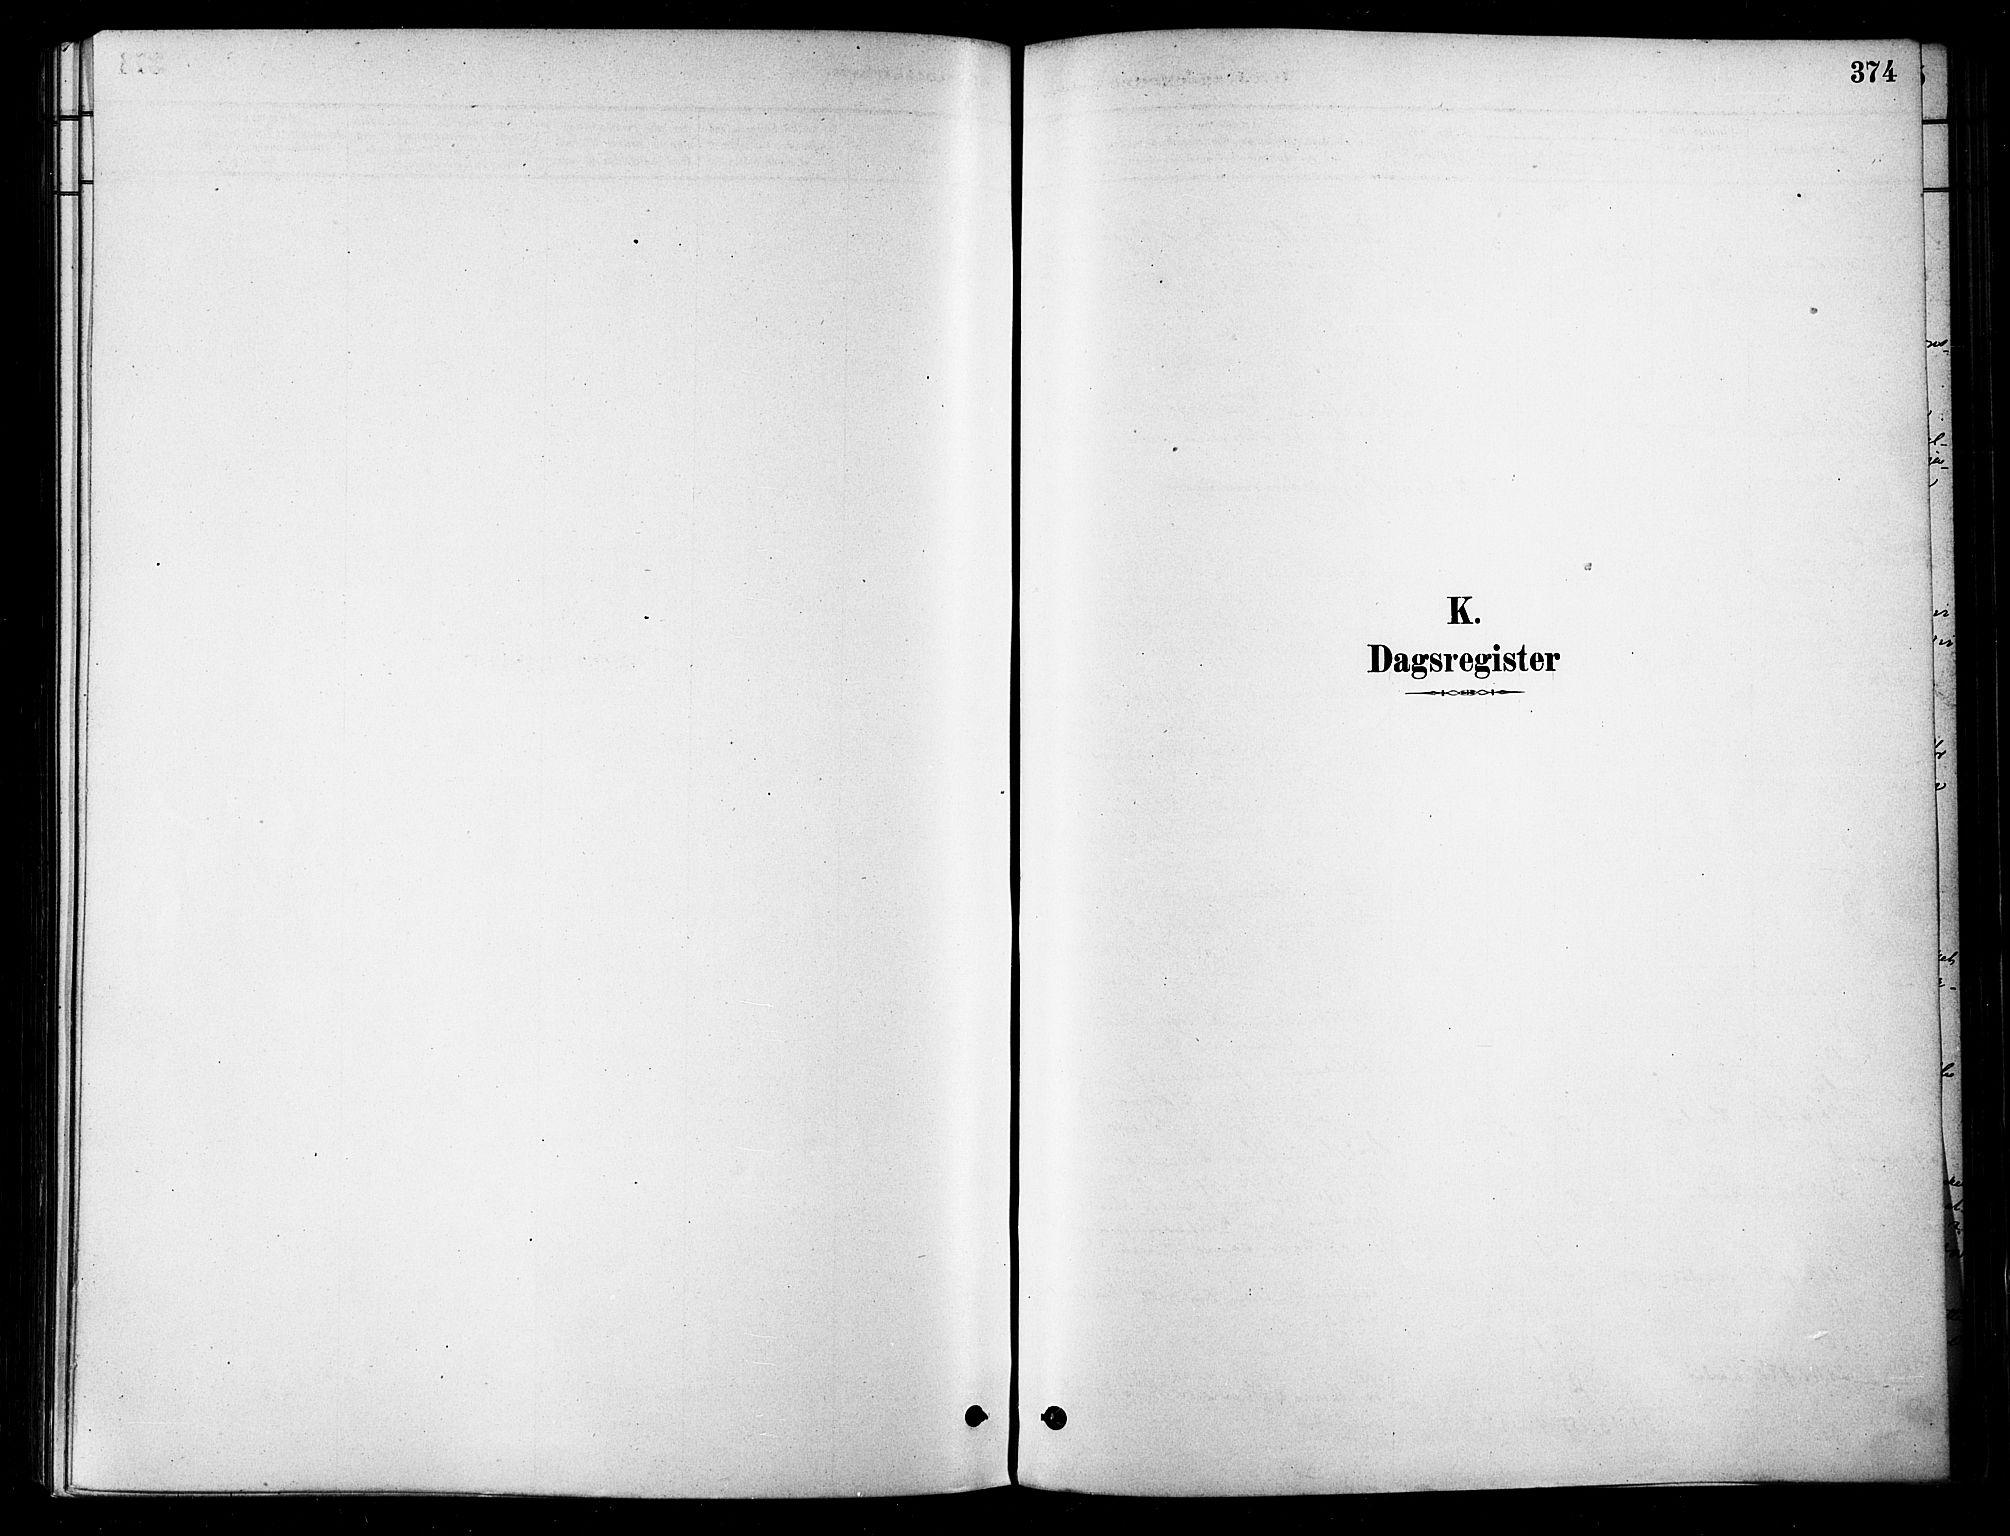 SATØ, Karlsøy sokneprestembete, H/Ha/Haa/L0006kirke: Ministerialbok nr. 6, 1879-1890, s. 374